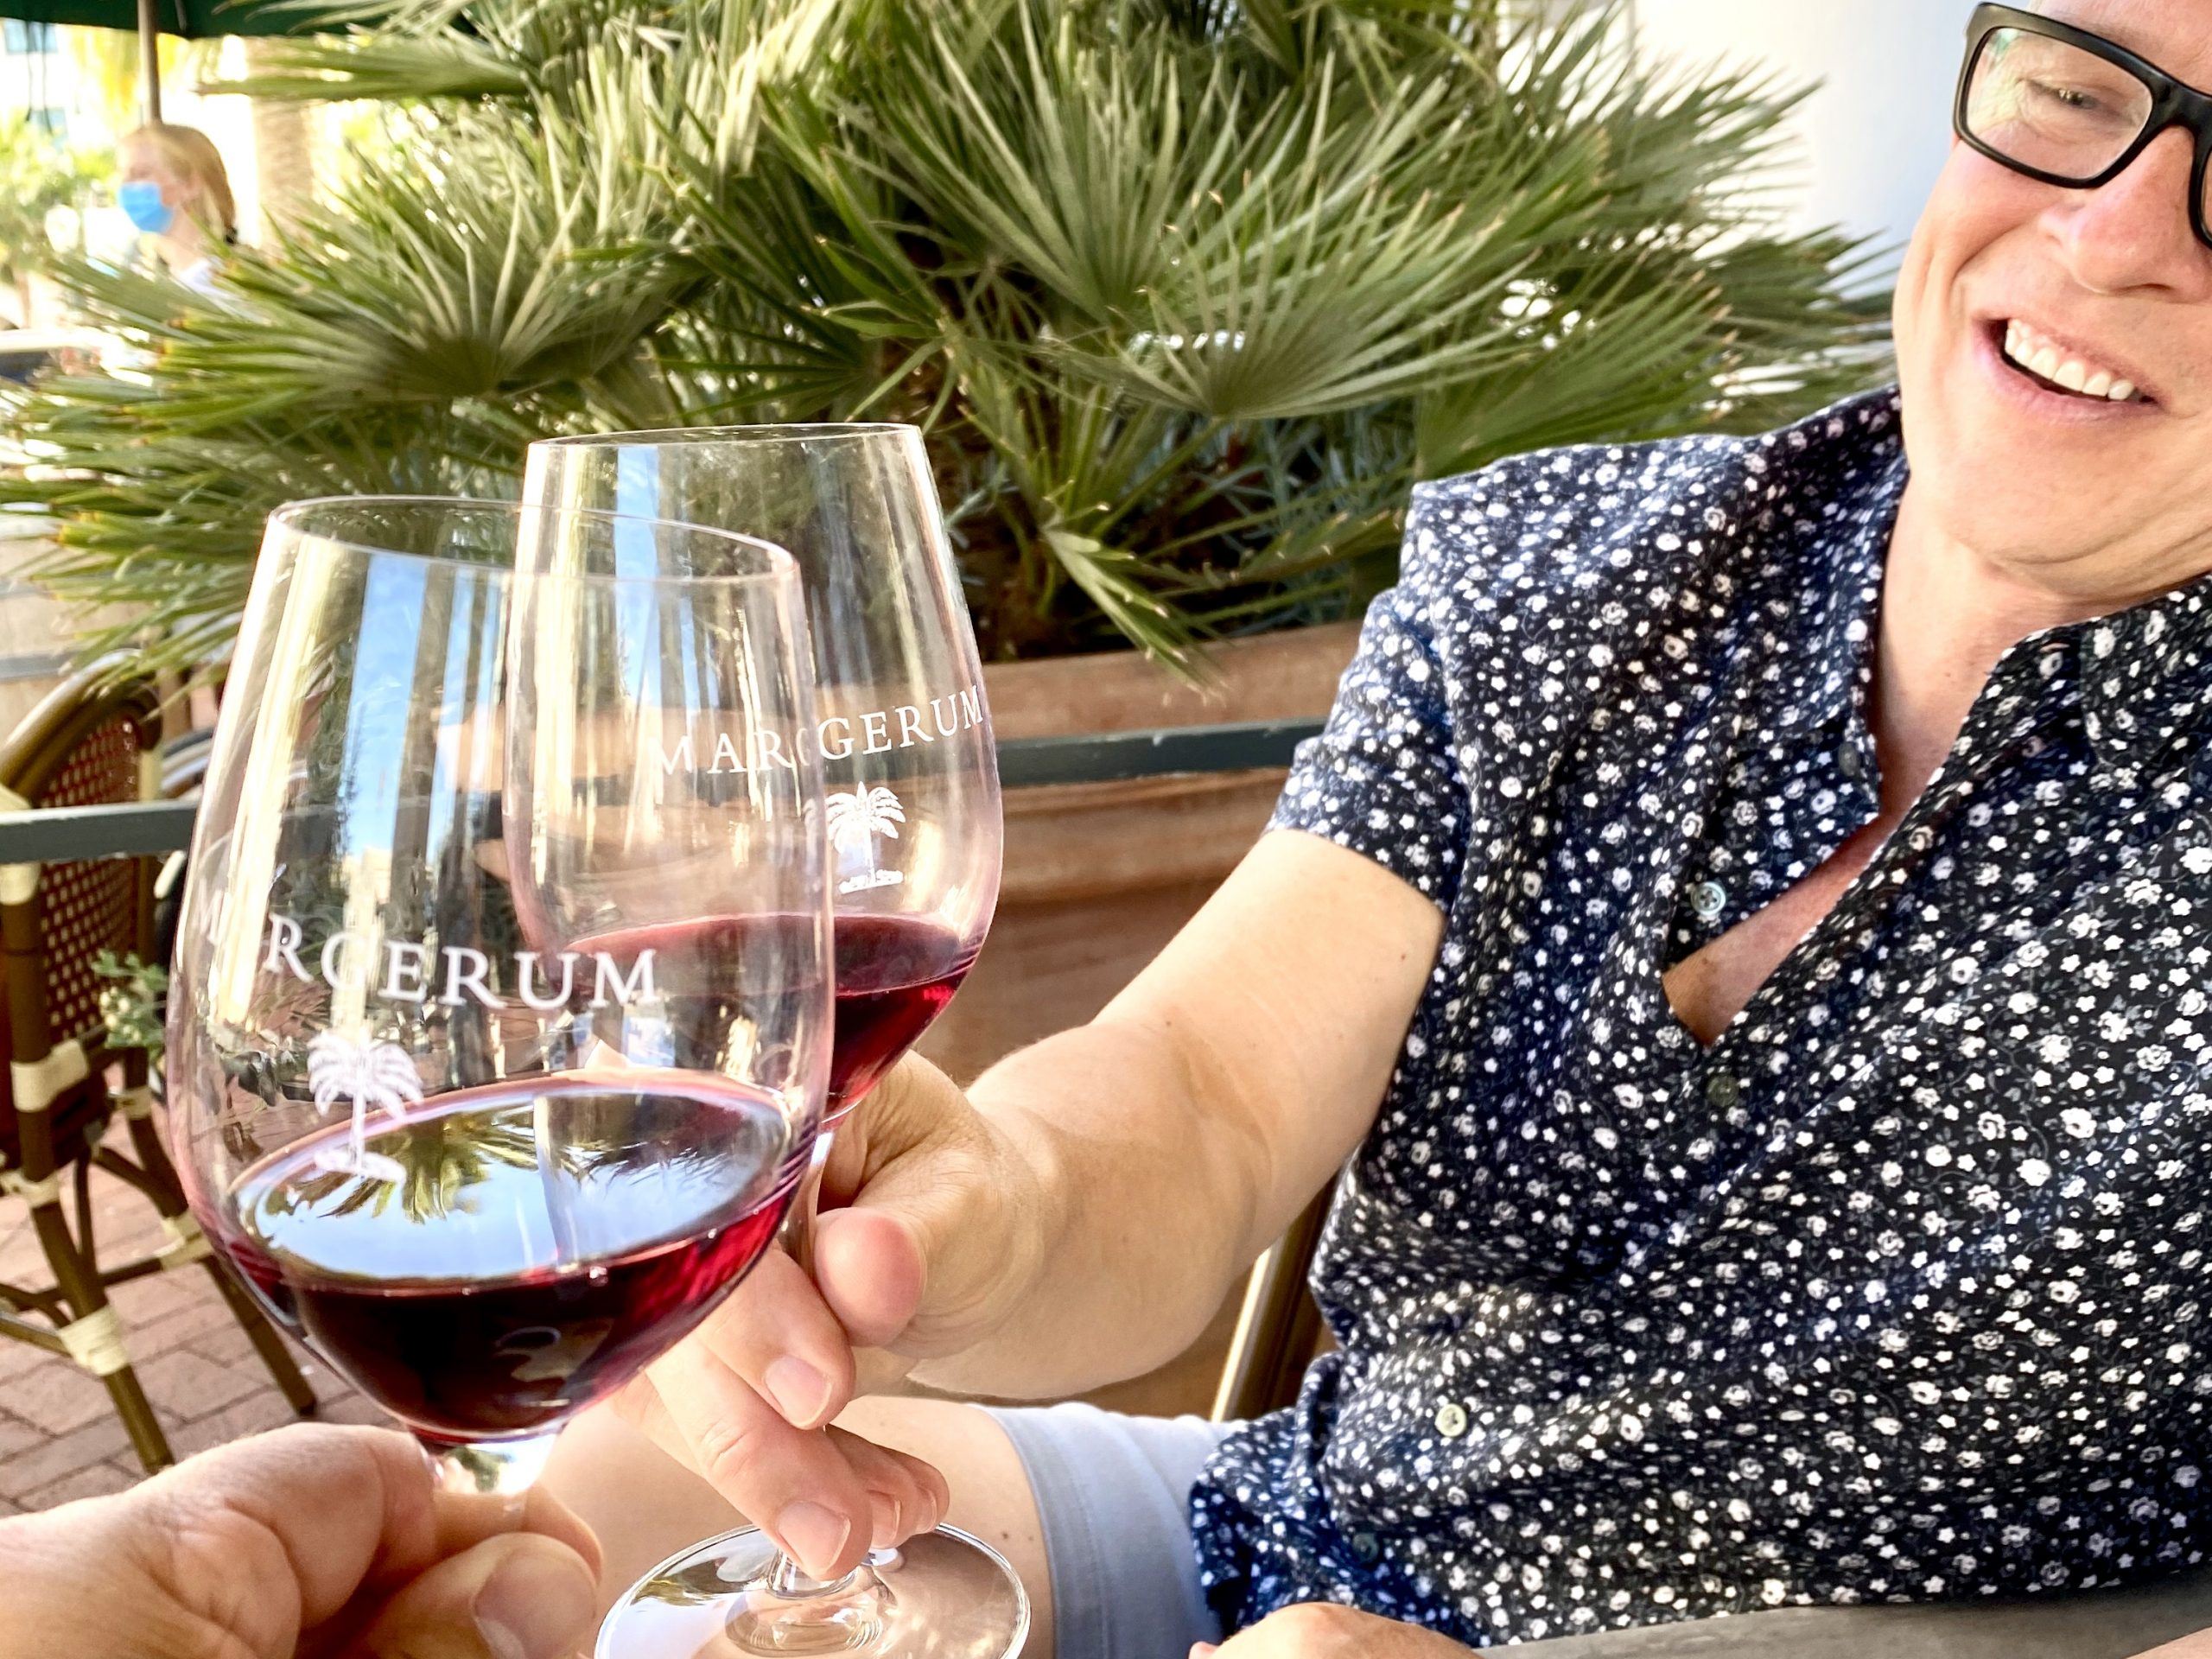 toasting wine glasses at Margerum Winery tasting room in Santa Barbara, CA